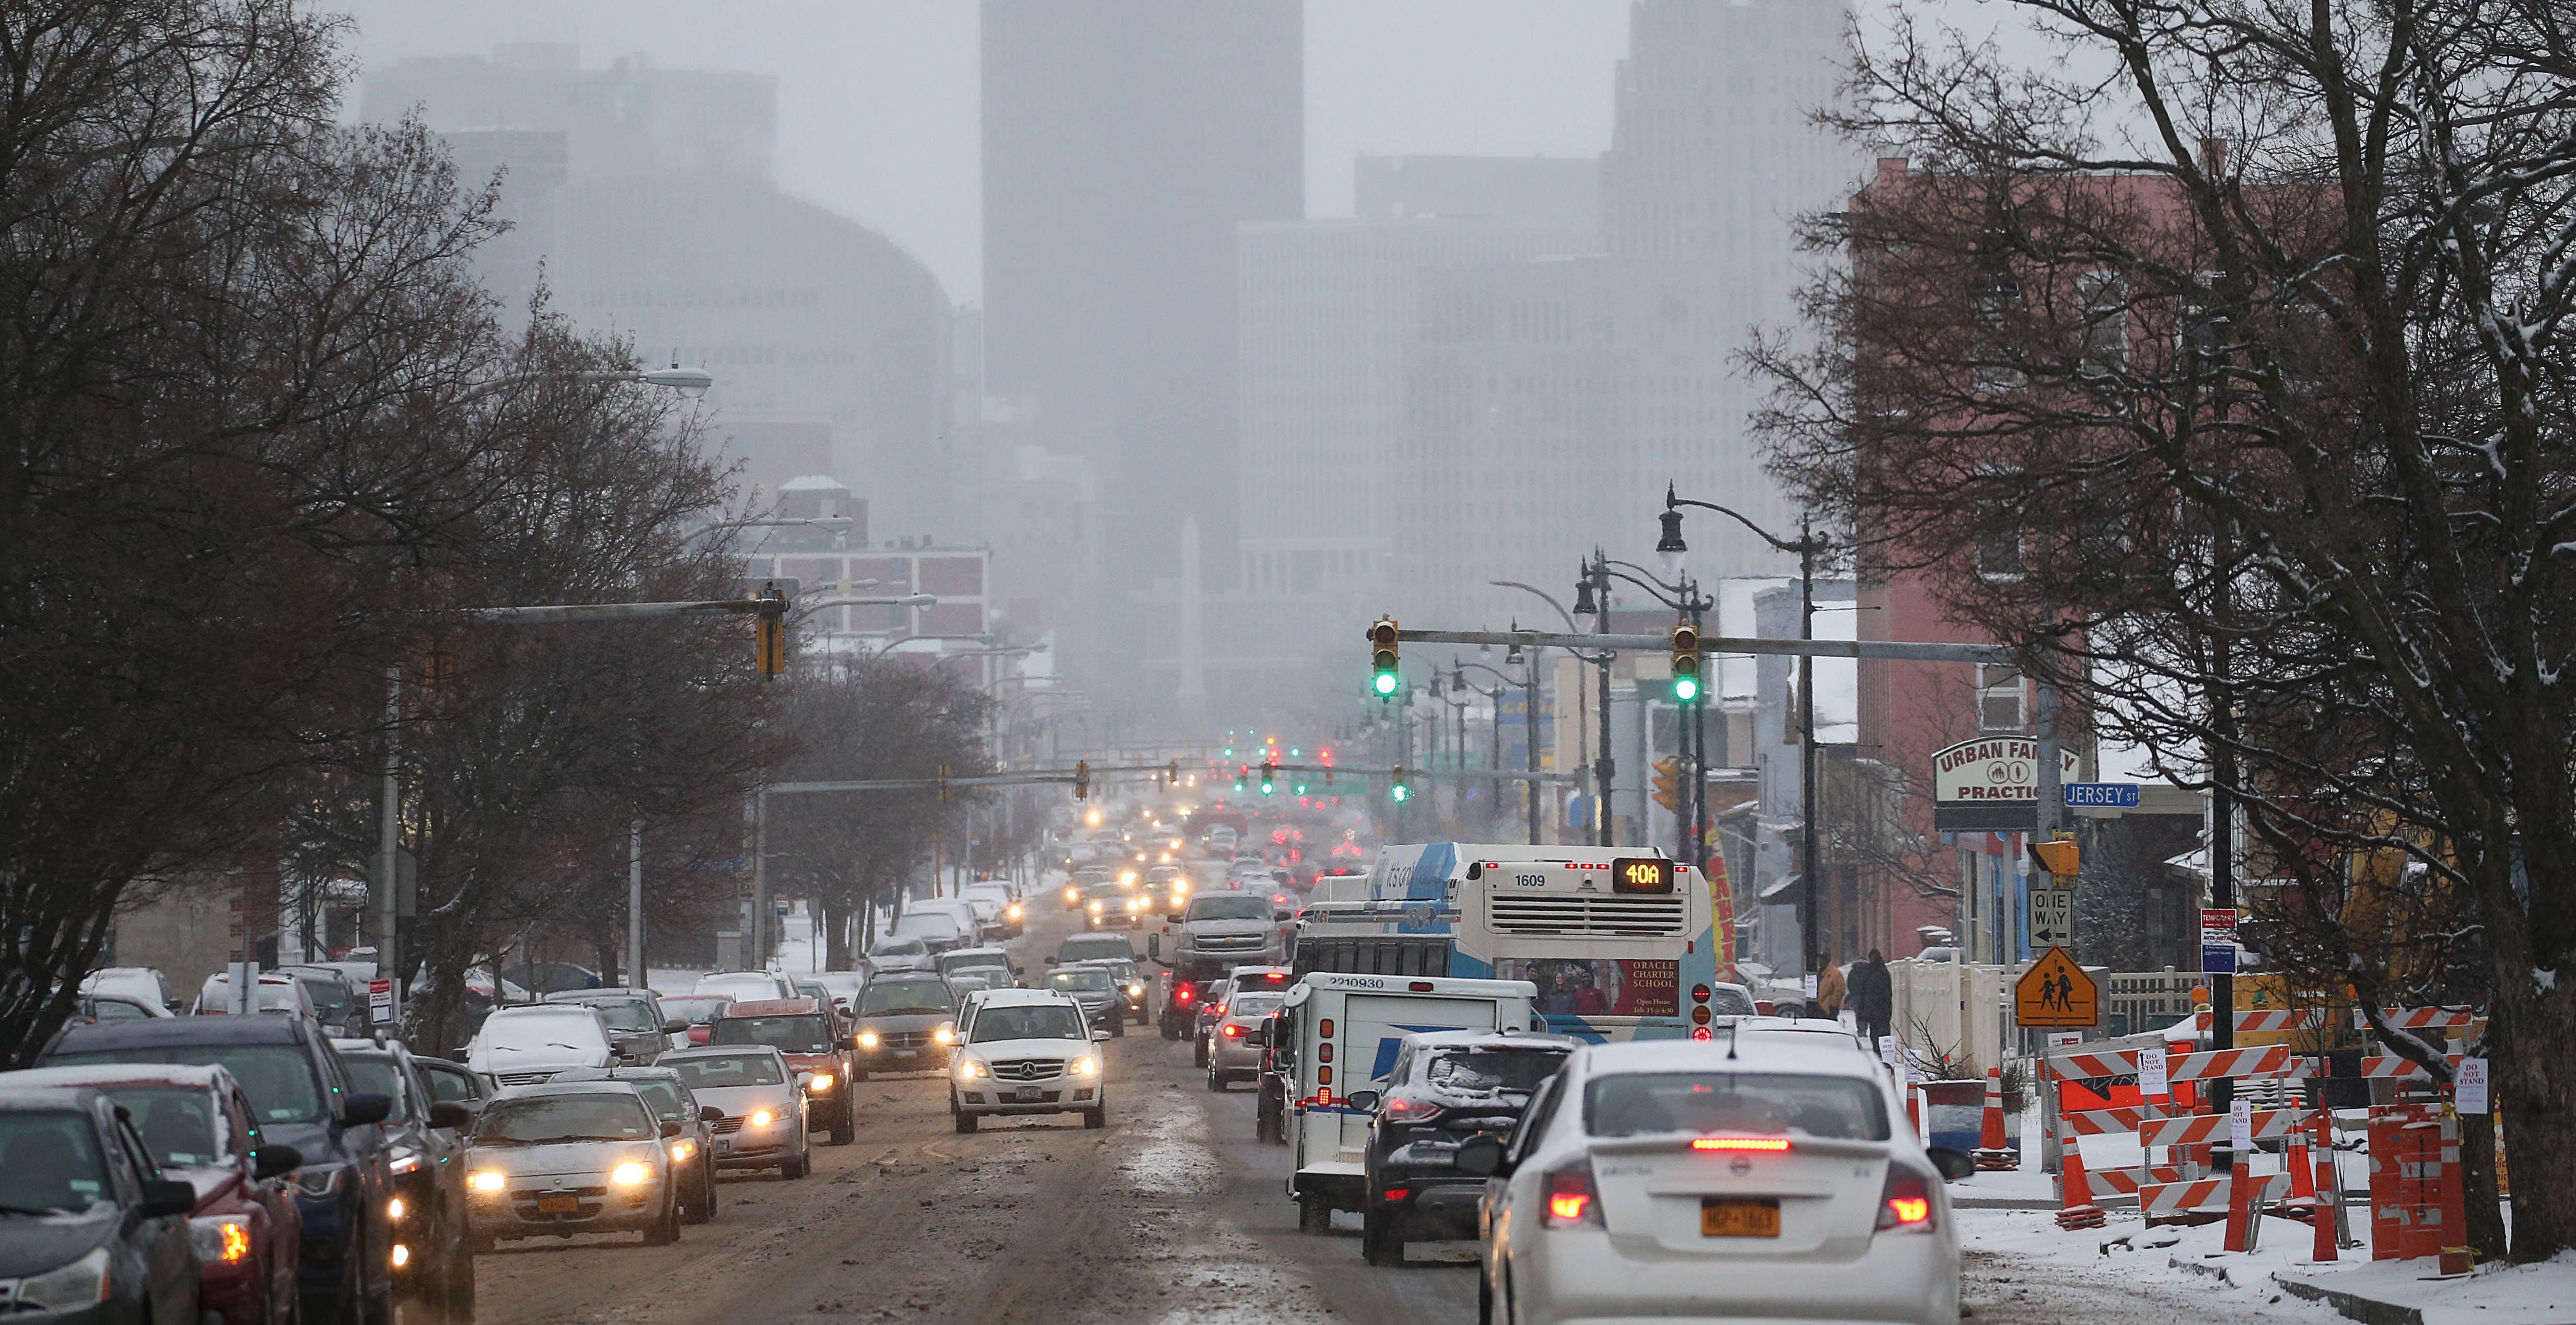 Snowfall left Niagara Street during rush hour looking hazy on Feb. 10. (Sharon Cantillon/News file photo)